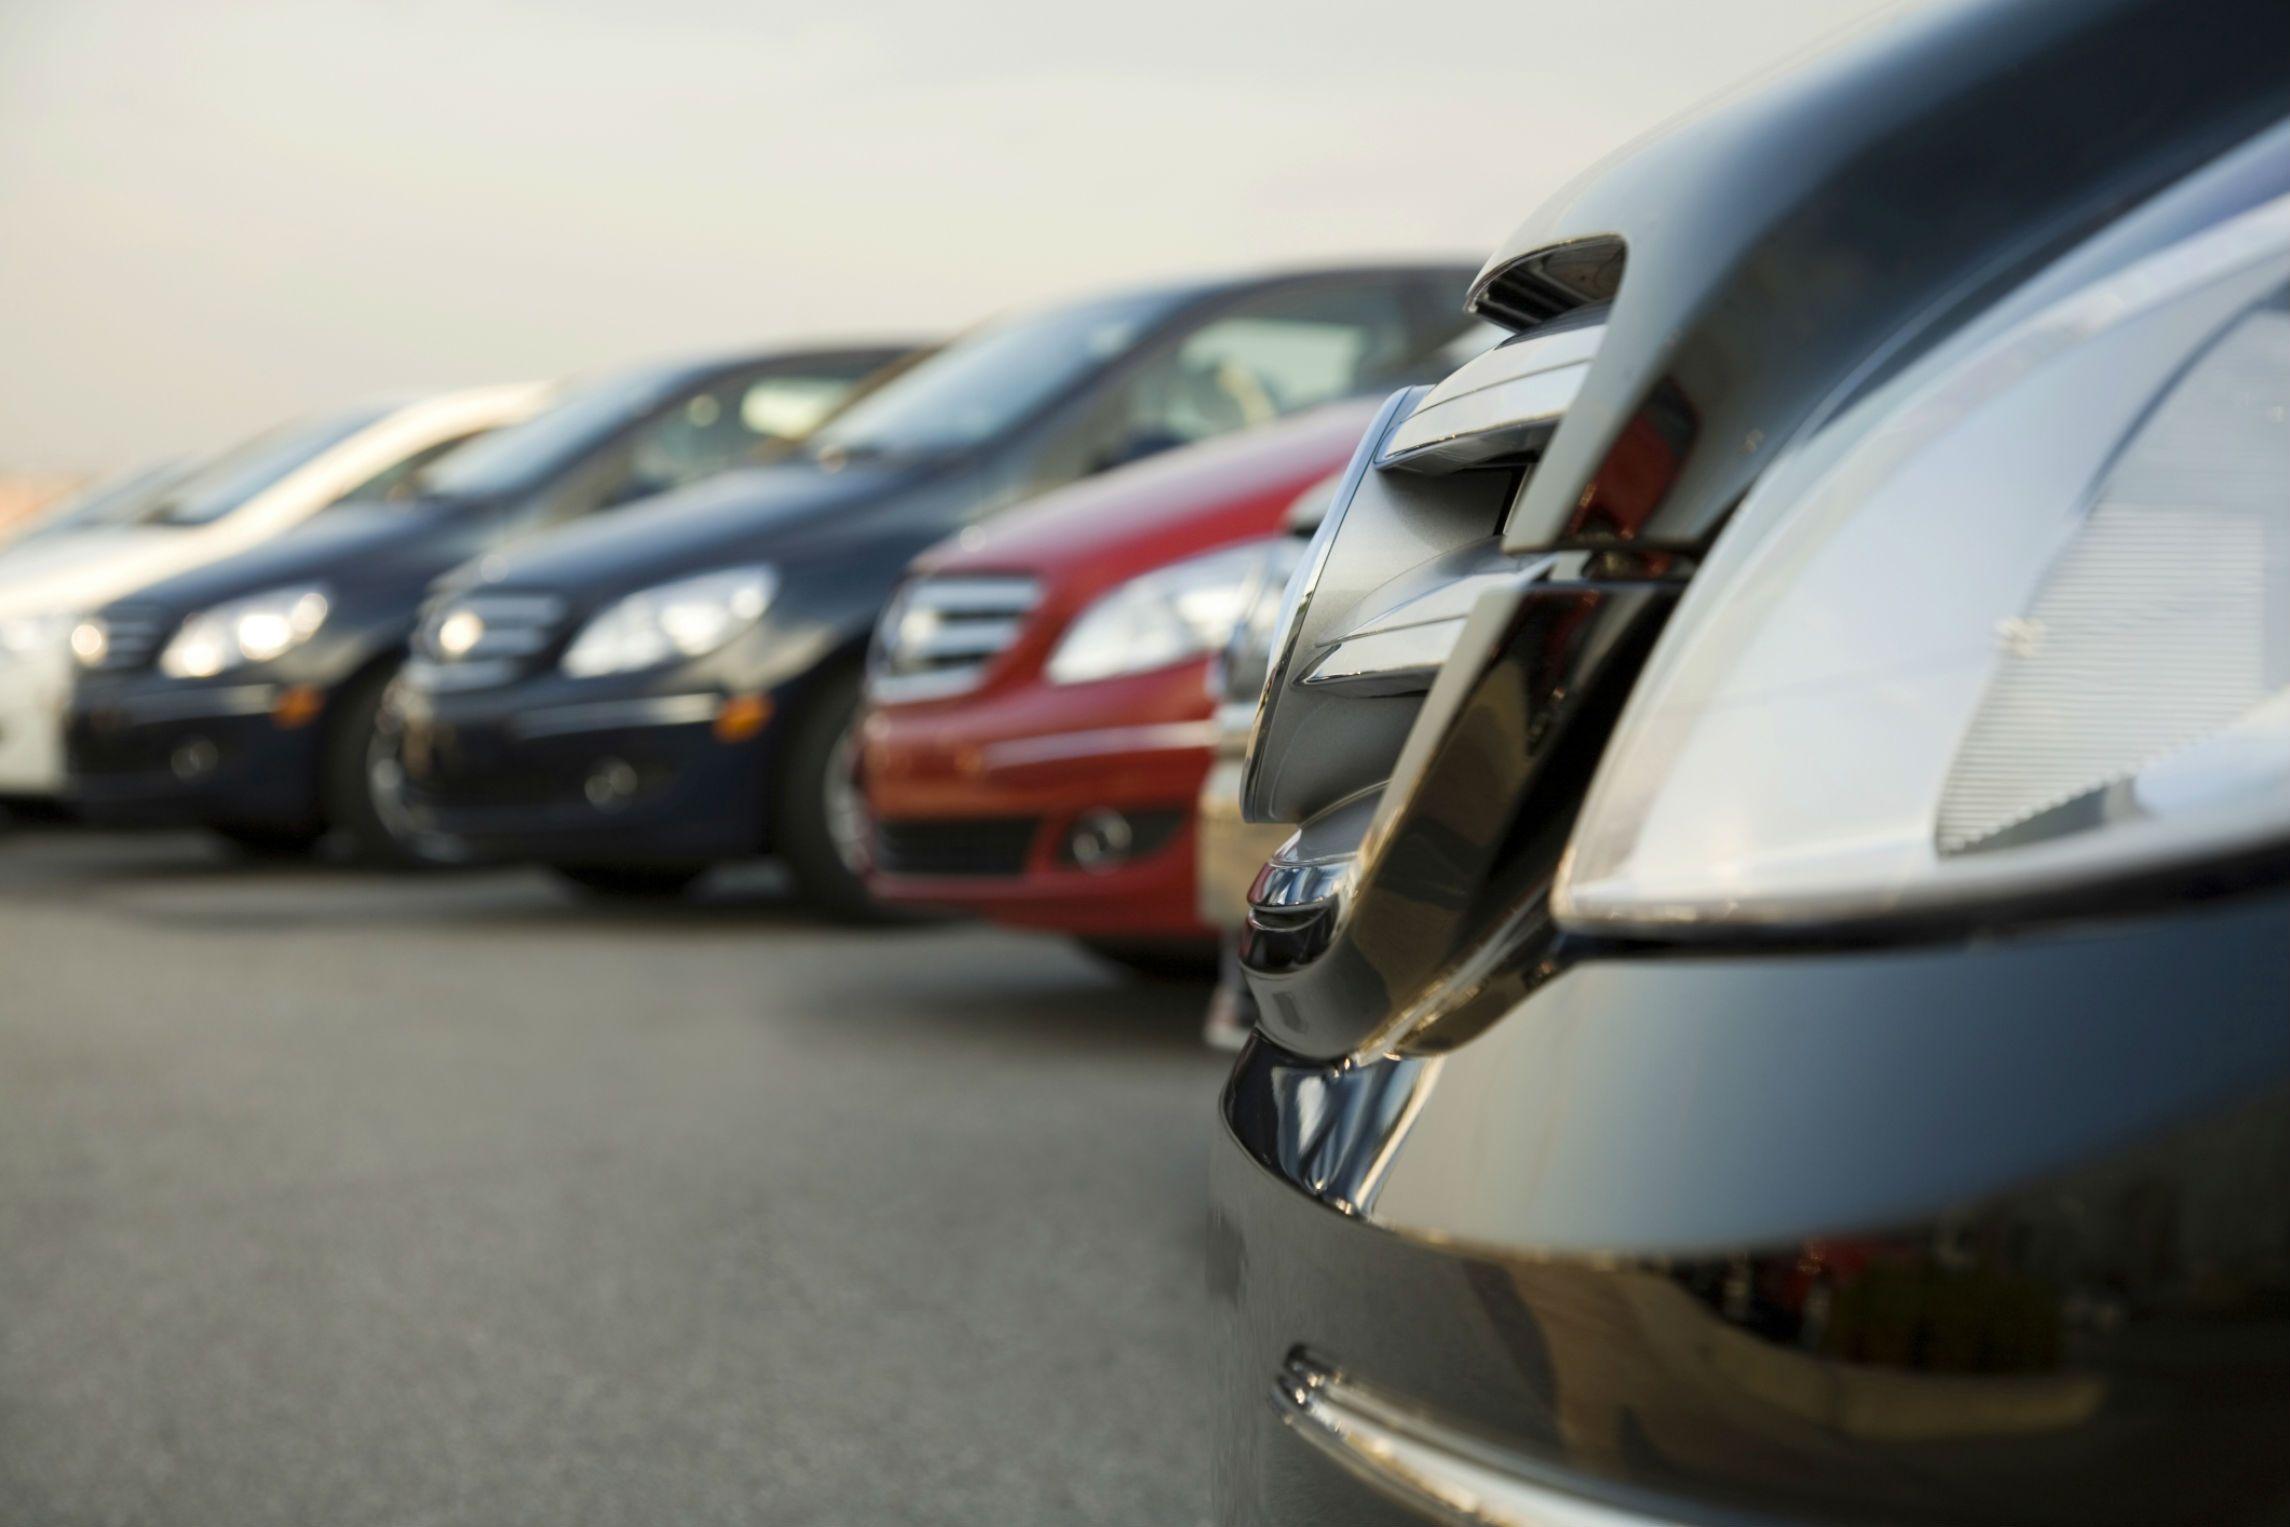 For a topgrade car dealer, reach Gem State Auto at (208